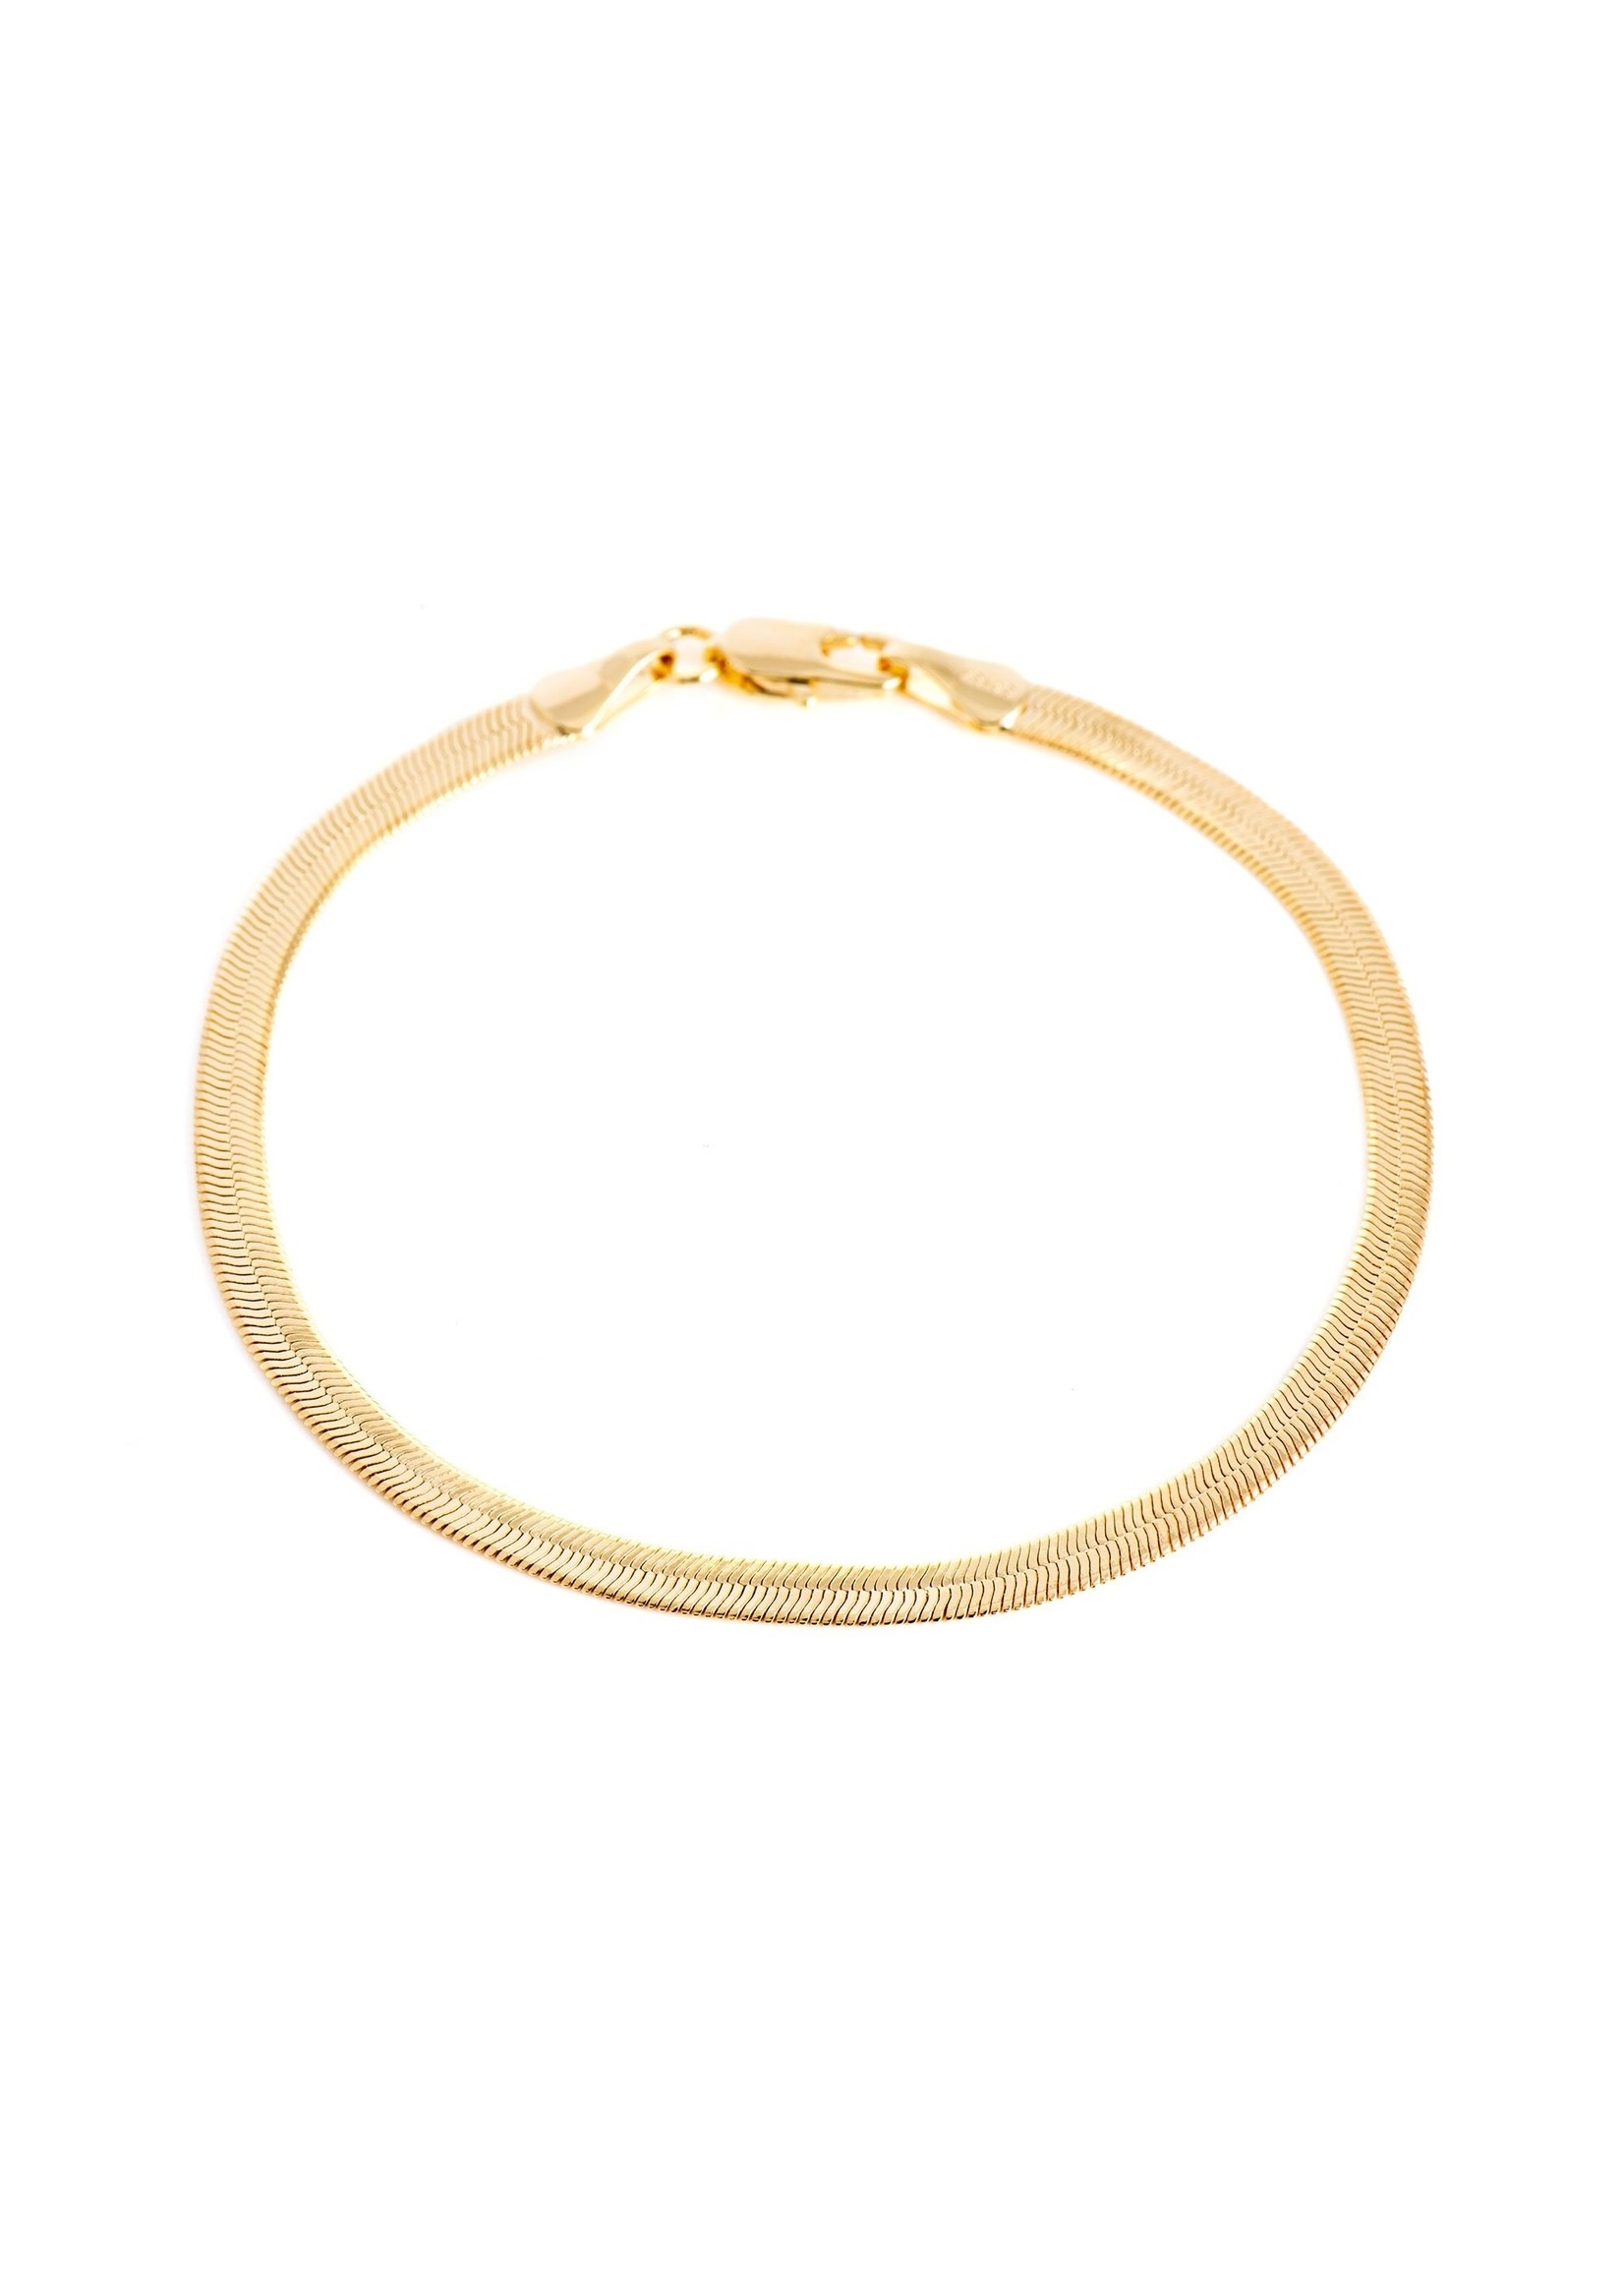 Lolo Jewellery Herringbone Bracelet - Gold